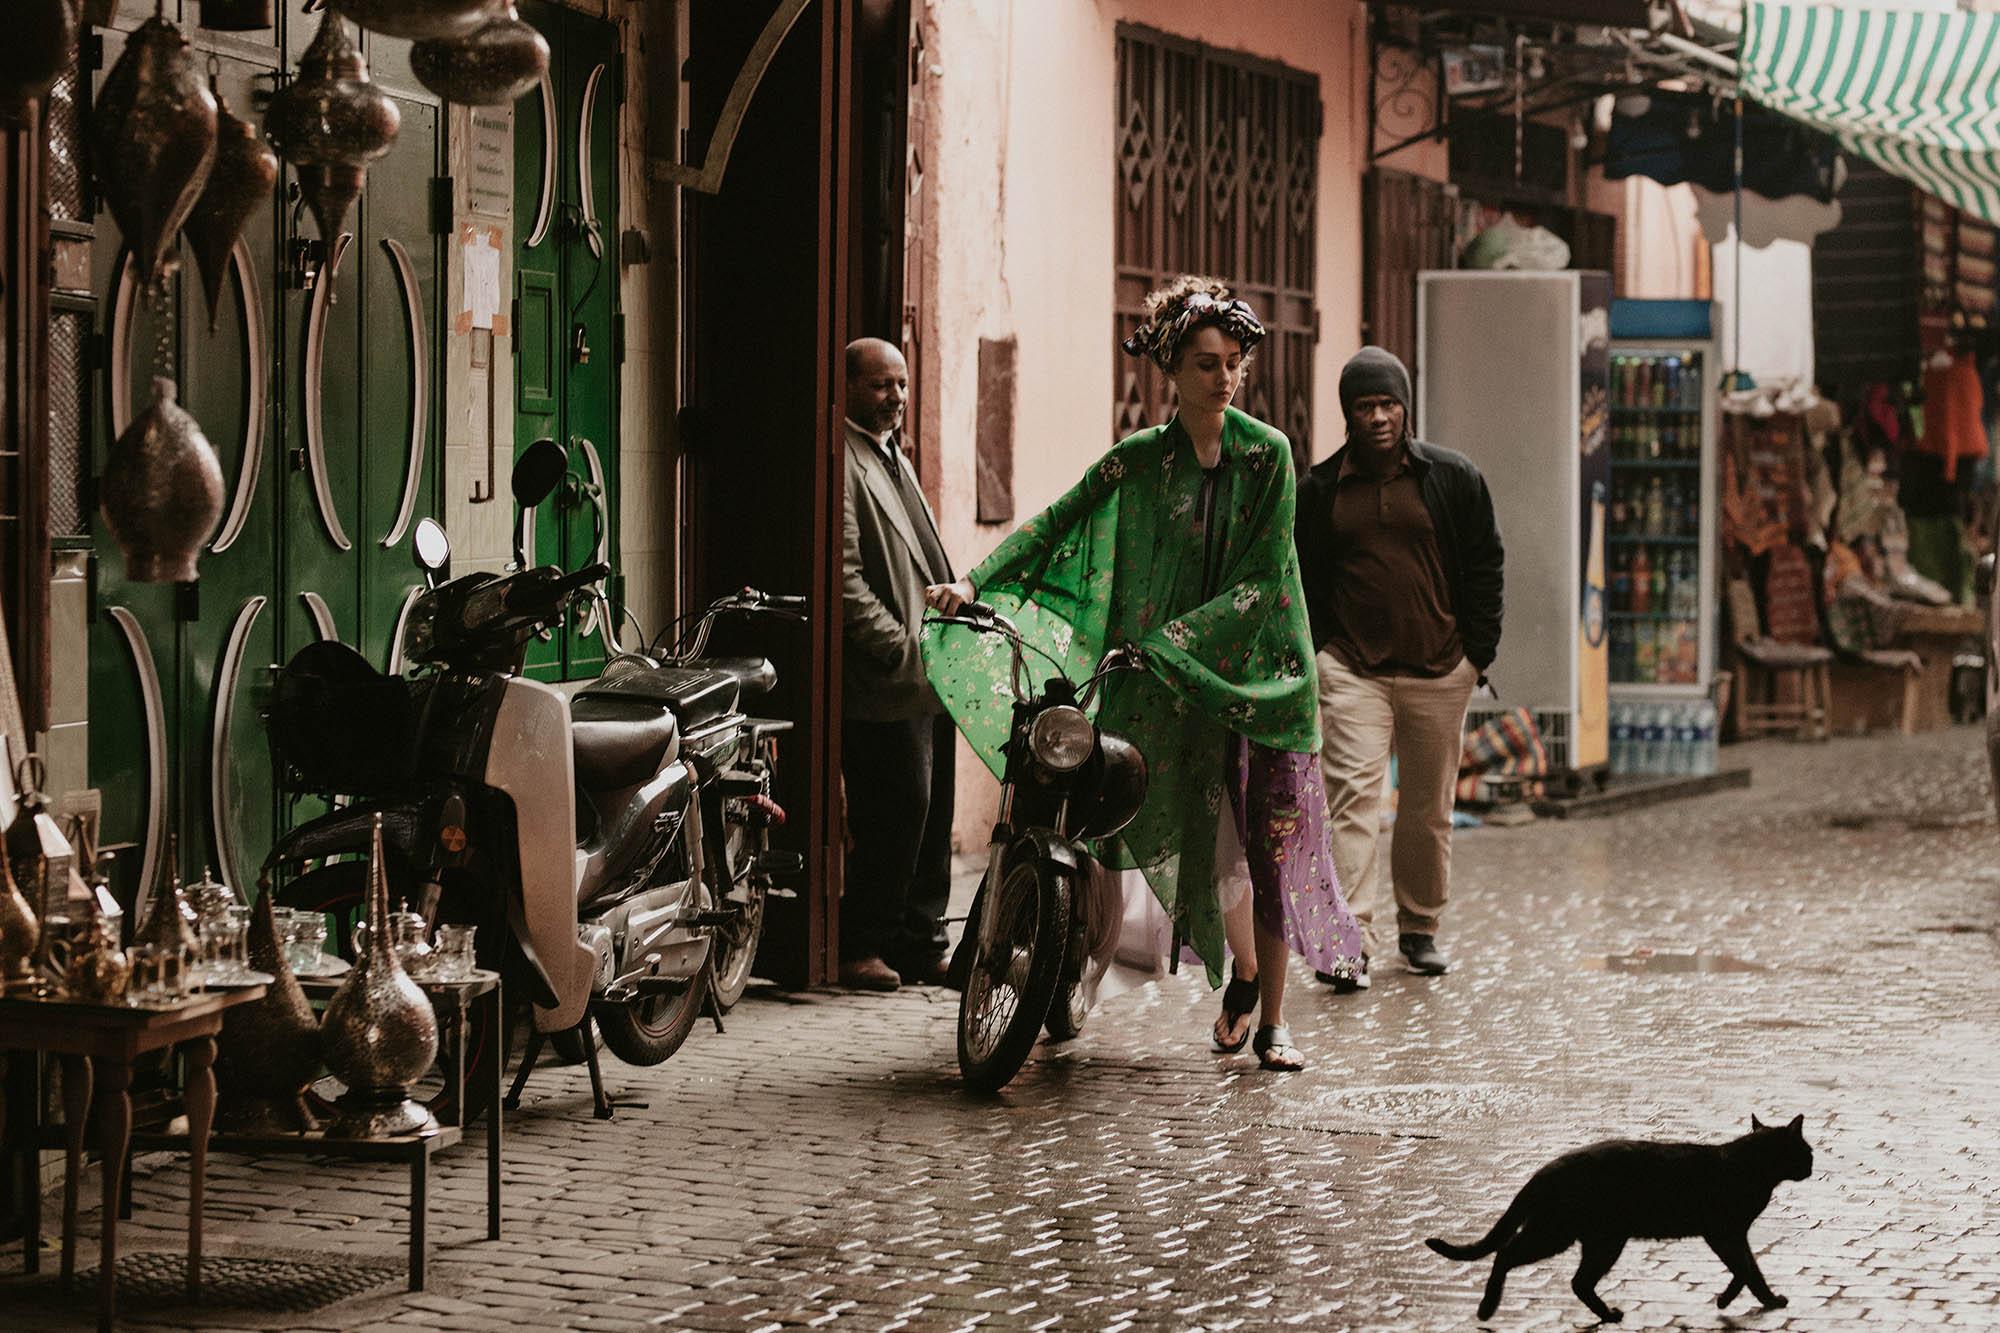 платье, Zadig & Voltaire; блузка, надетая как чалма, Chaos by Marta Boliglova; сандалии, Sportmax